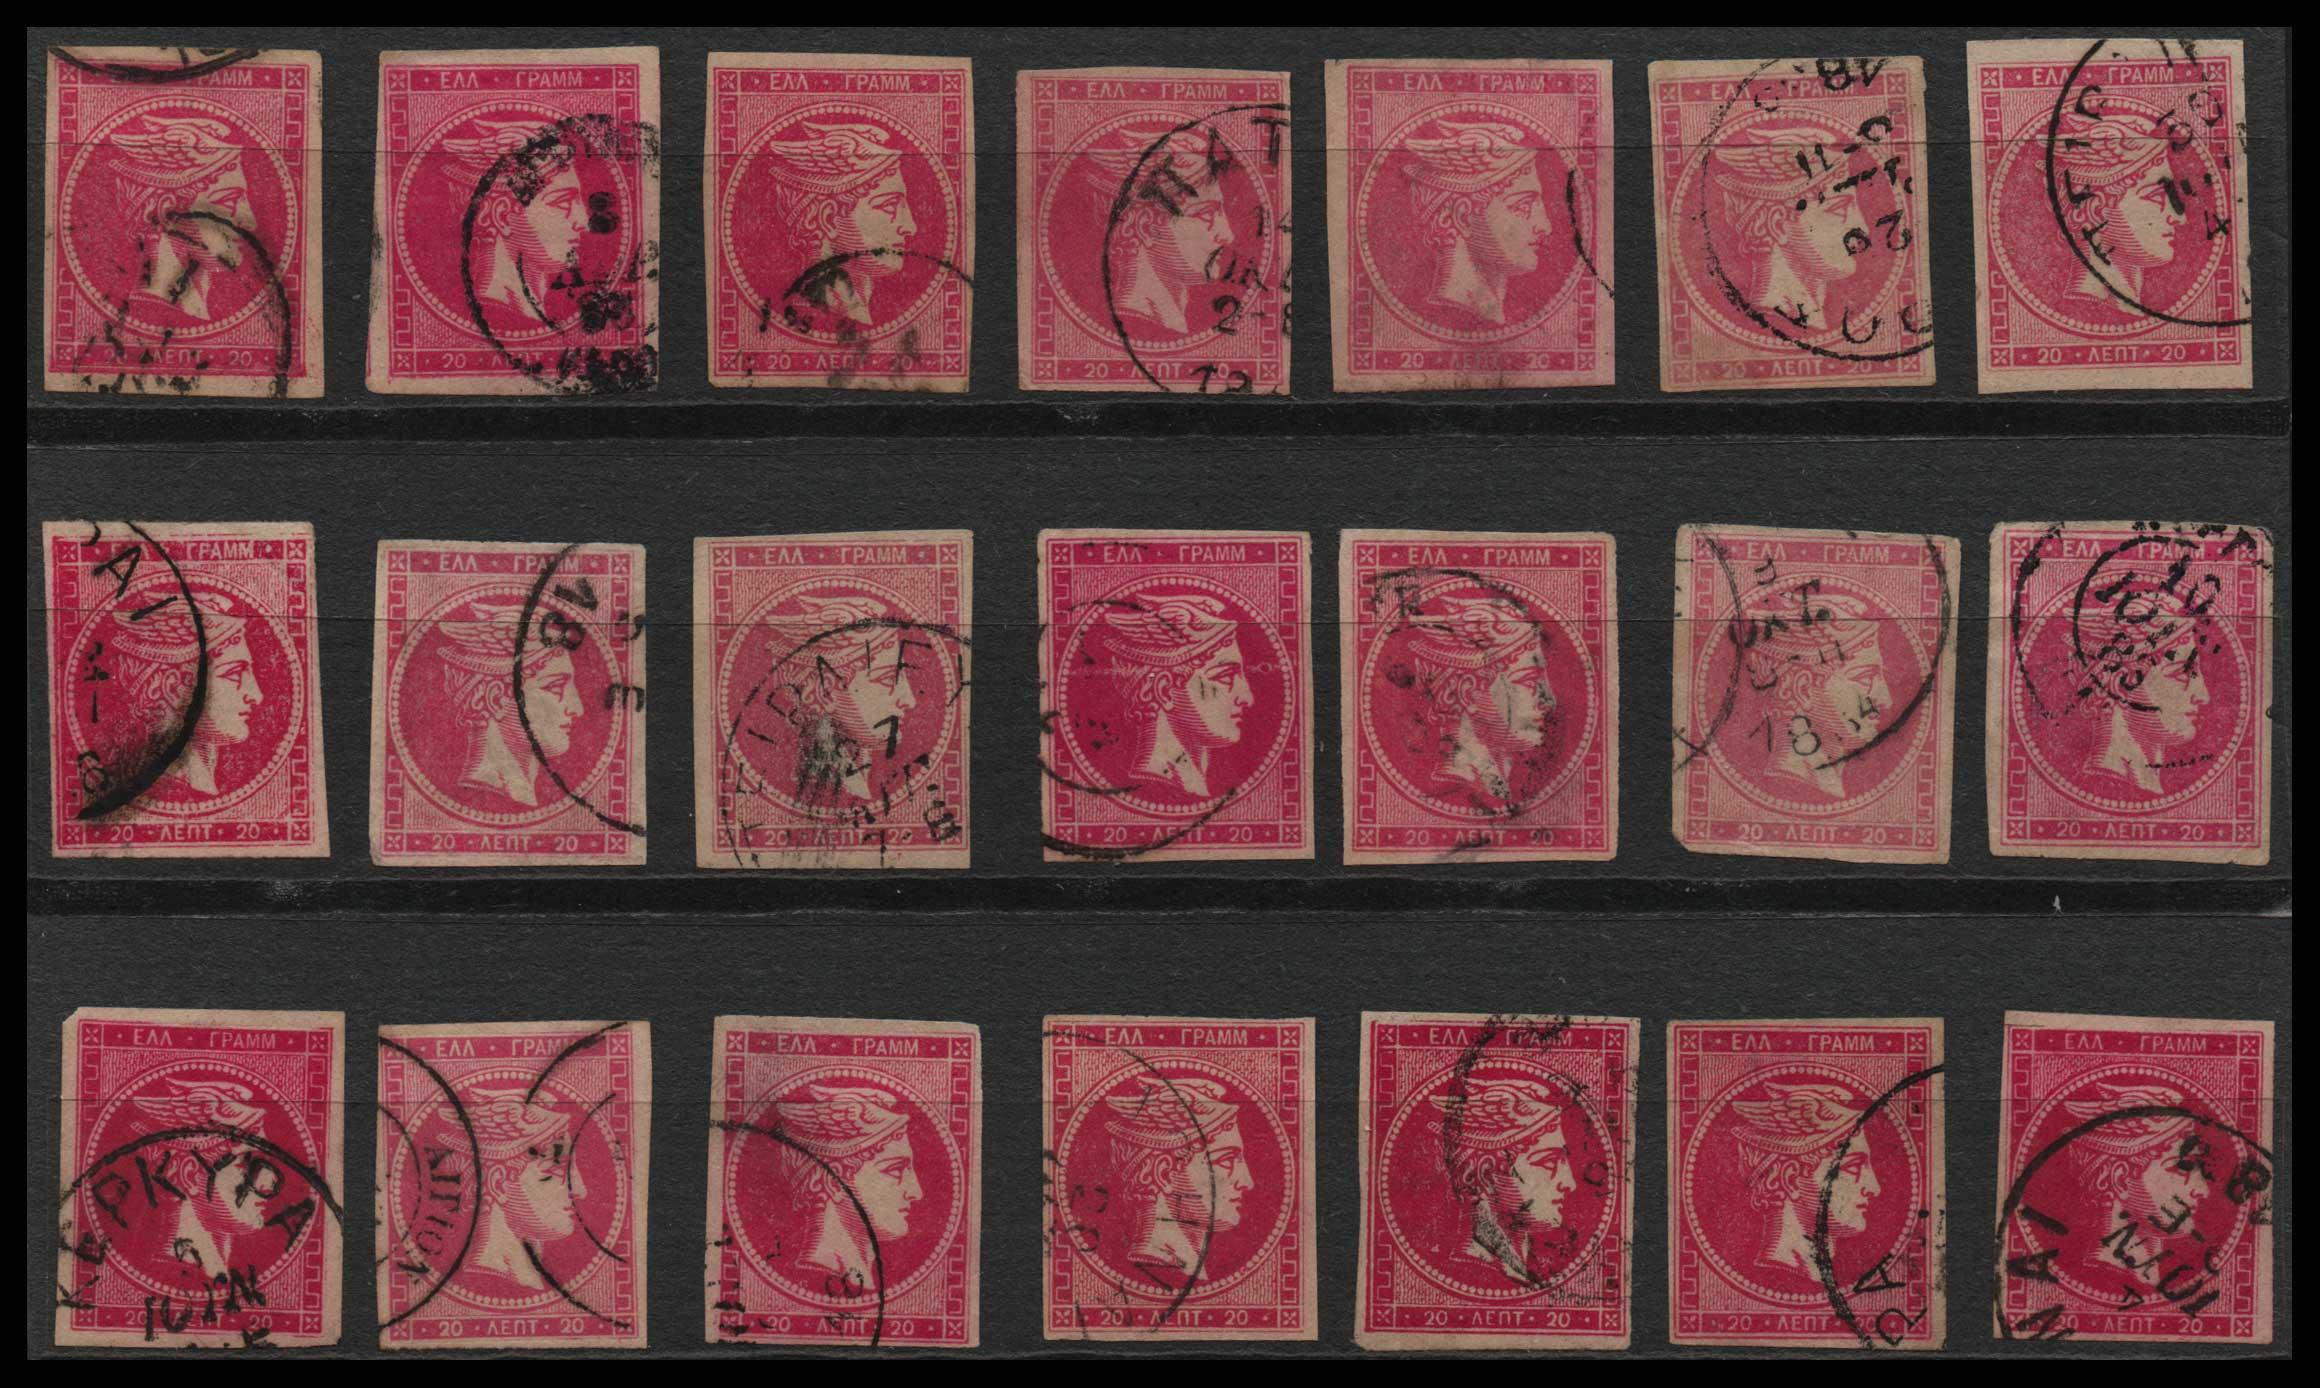 Lot 31 - -  LARGE HERMES HEAD large hermes head -  Athens Auctions Public Auction 83 General Stamp Sale